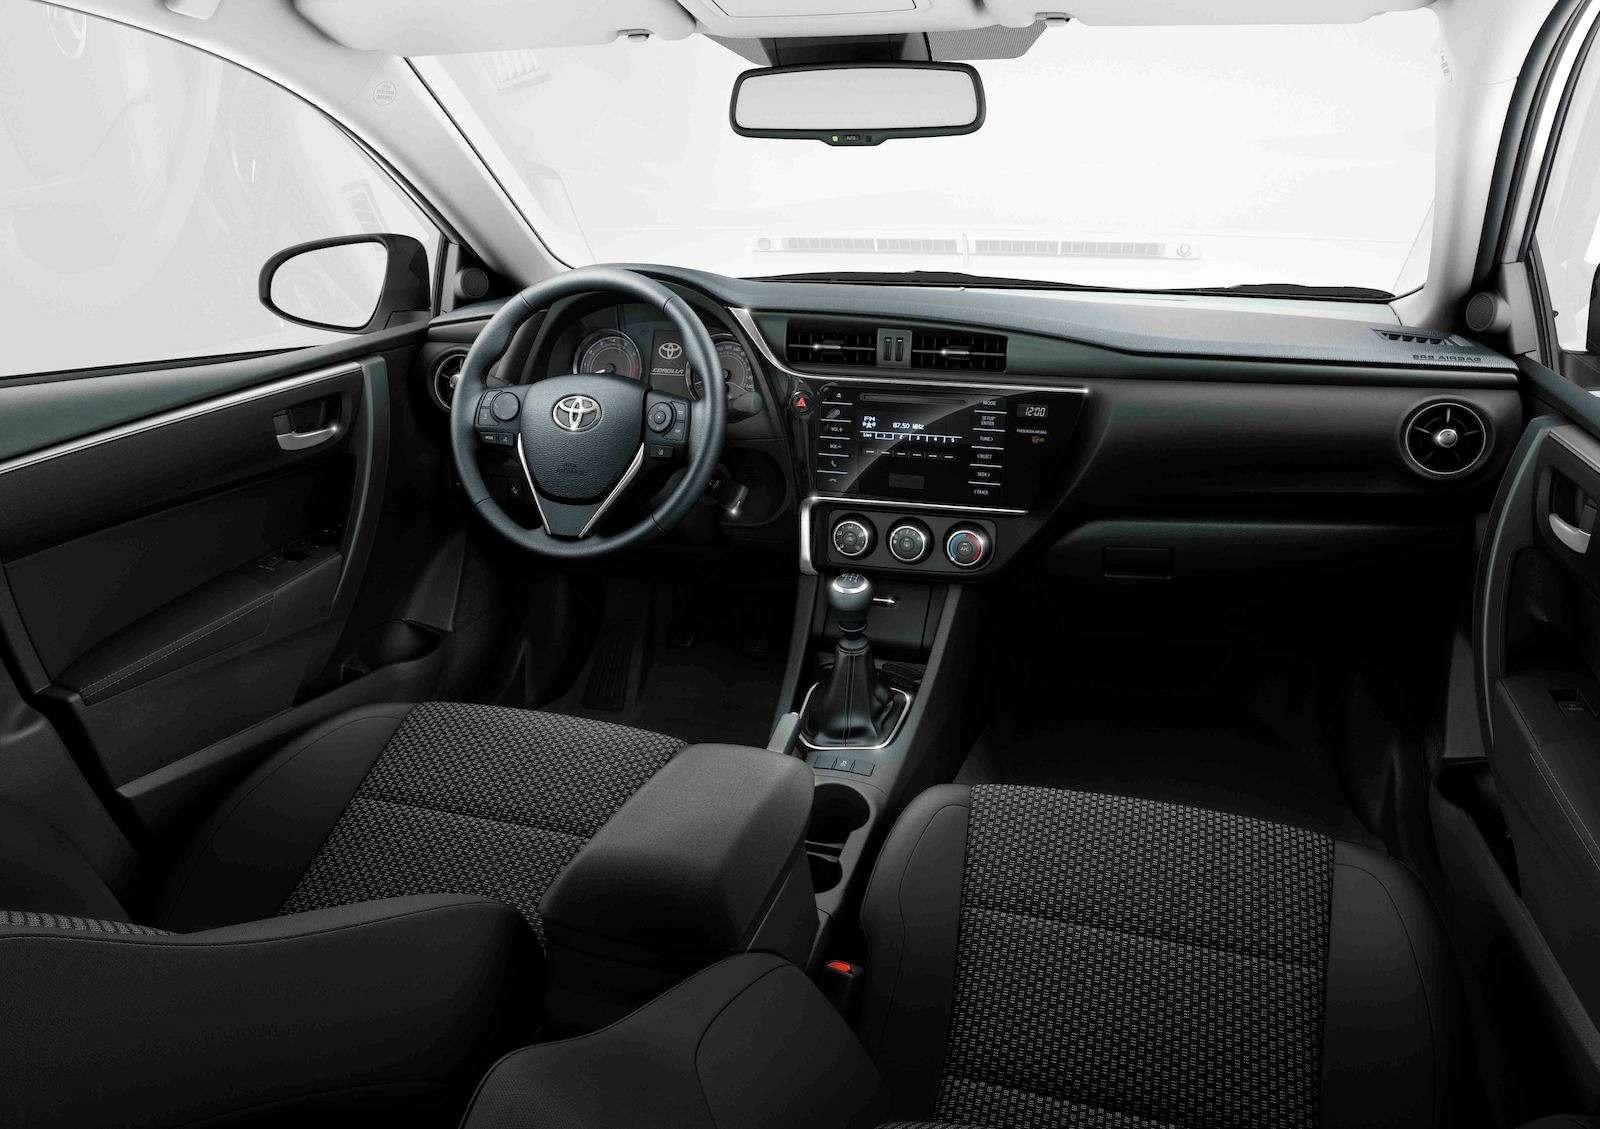 Toyota представила обновленный седан Corolla— фото 599033